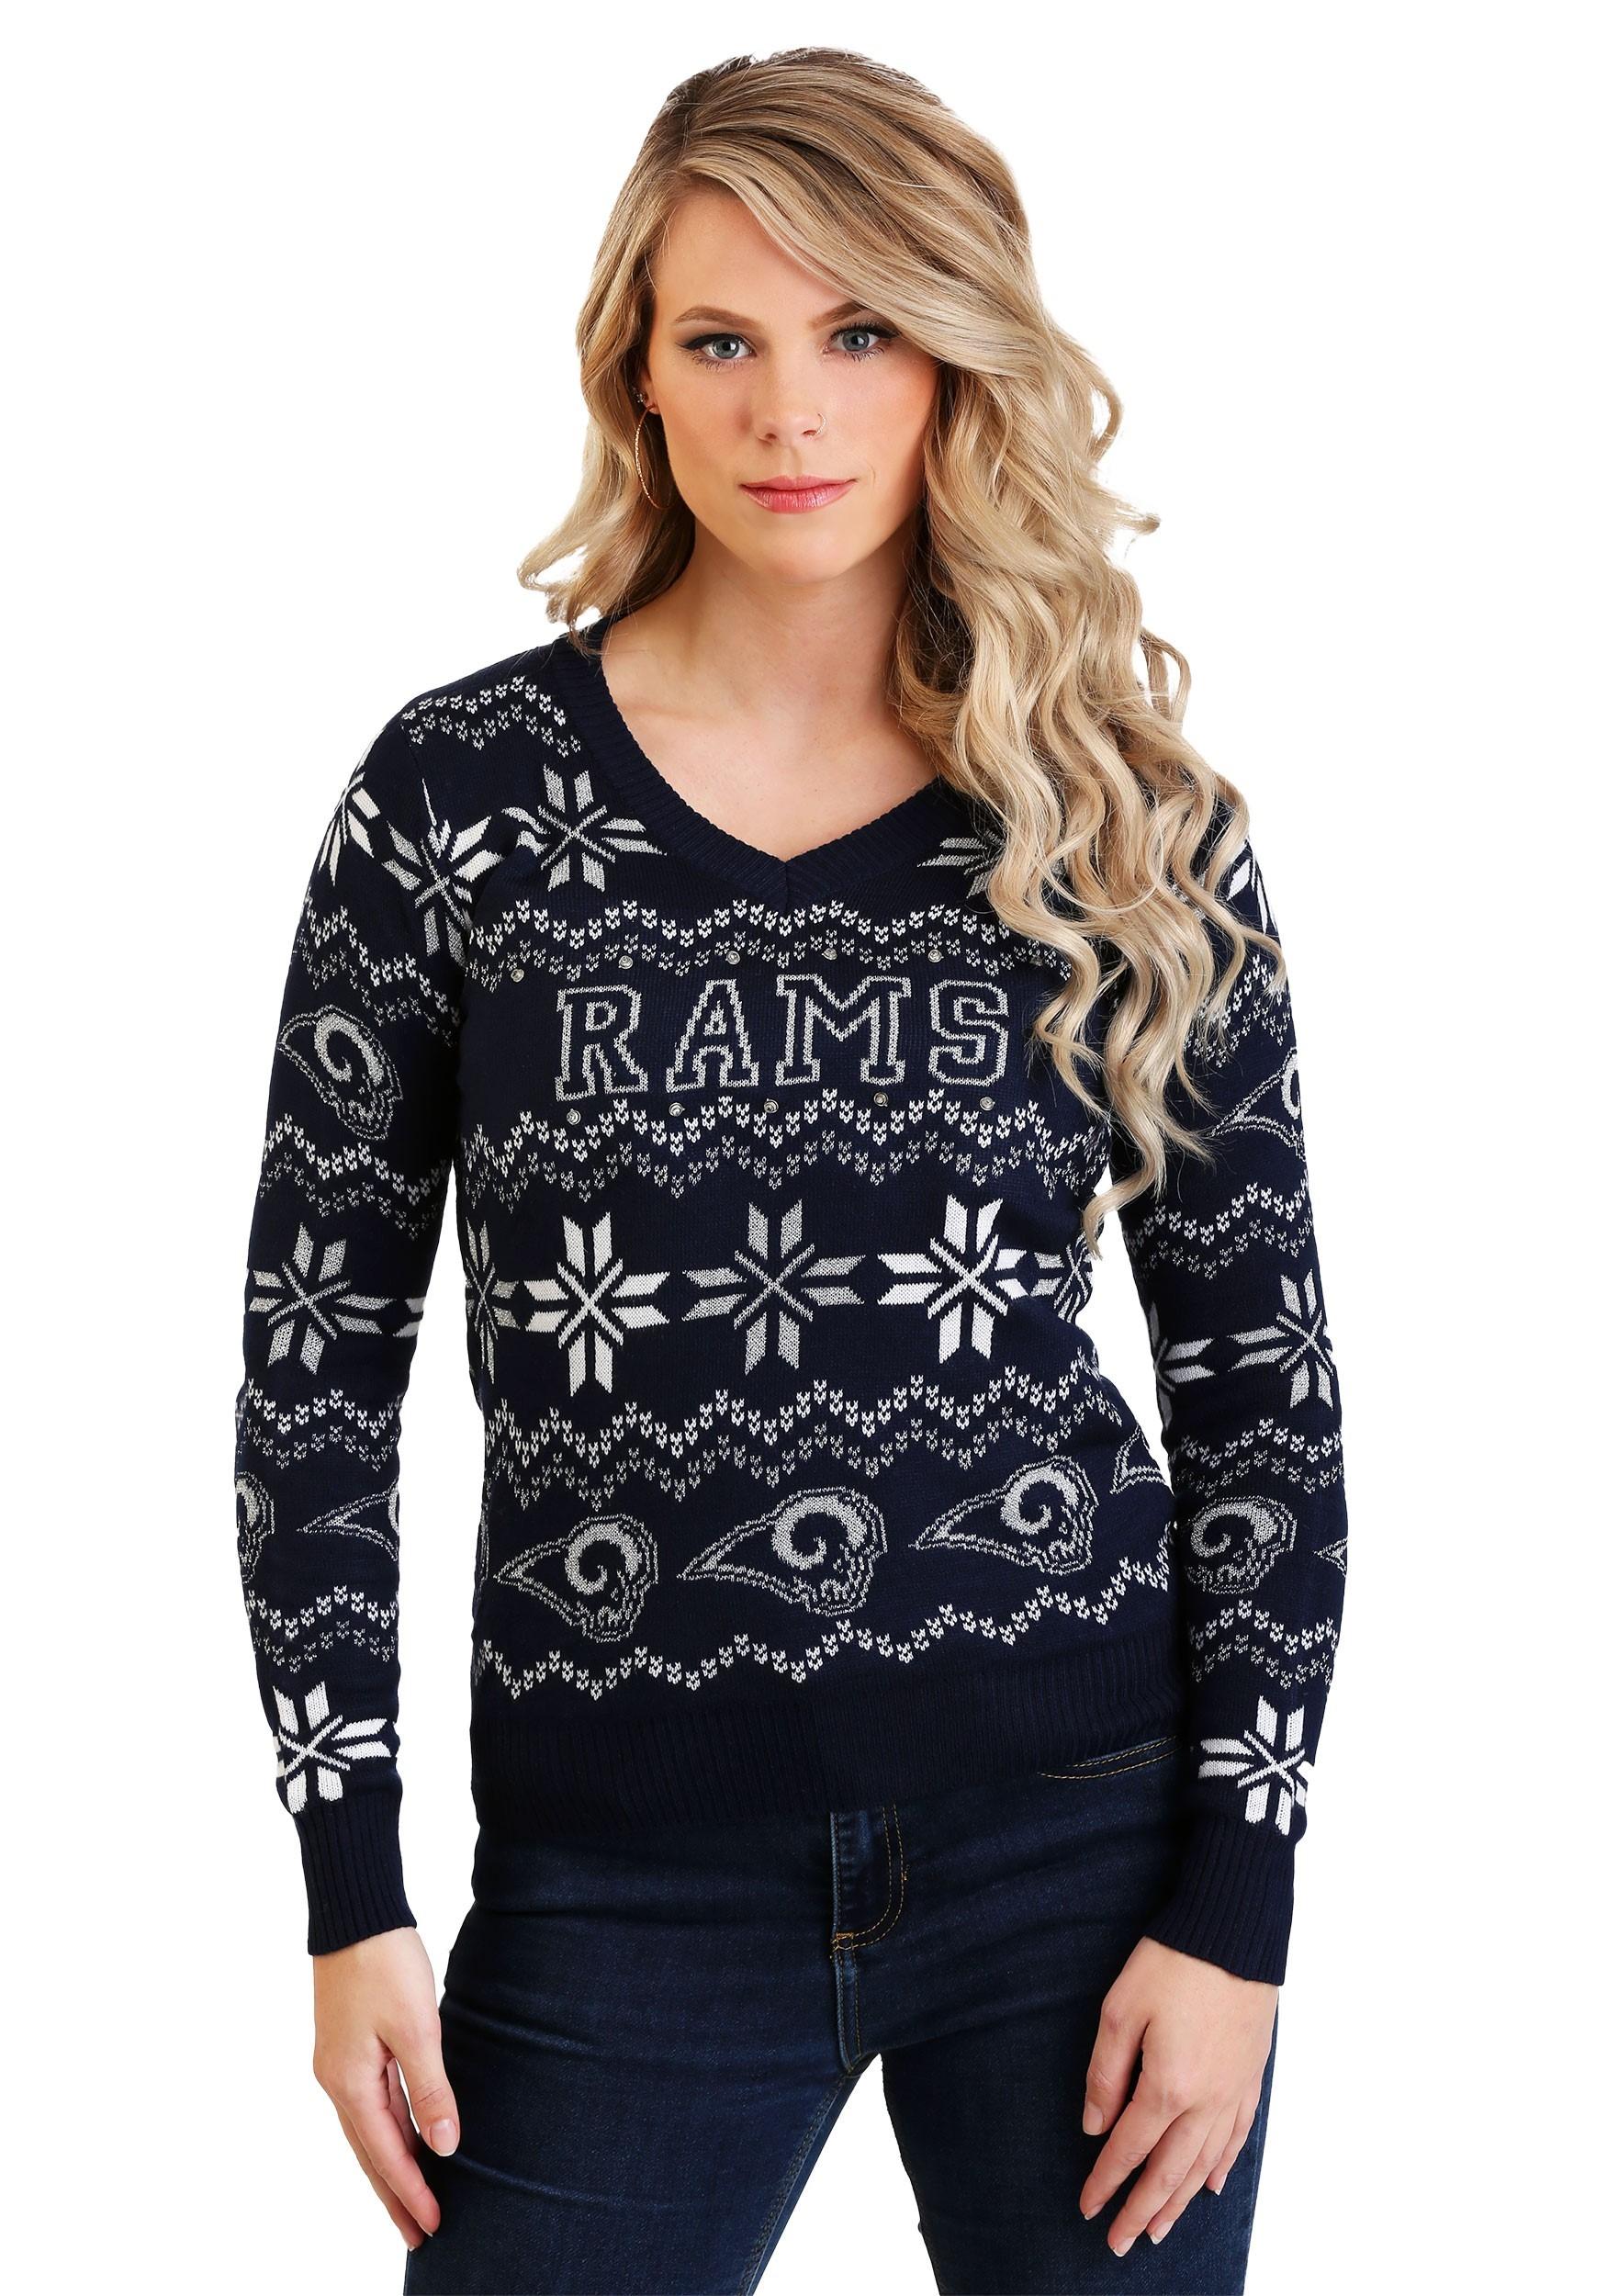 Women's Los Angeles Rams Light Up V-Neck Bluetooth Sweater